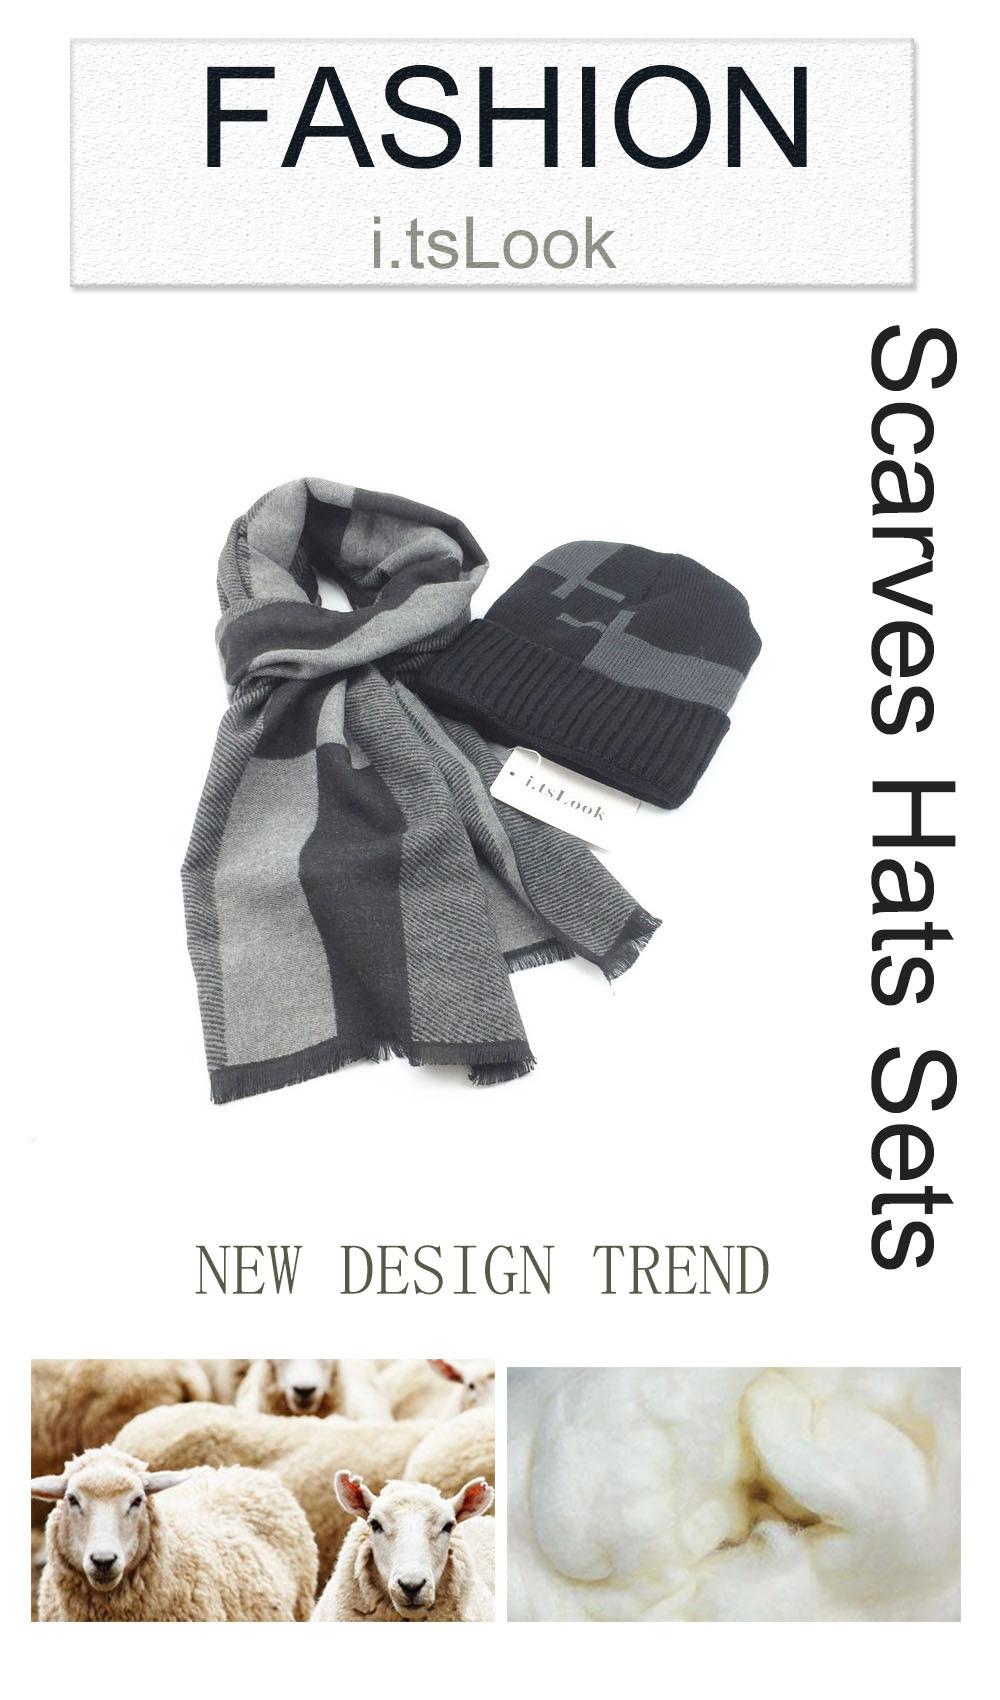 b518426d8d937 ... Beanies Snow Cap Christmas gifts BF-403. Brand  i.tsLook. Description   bufanda. Style  2017 Men scarf